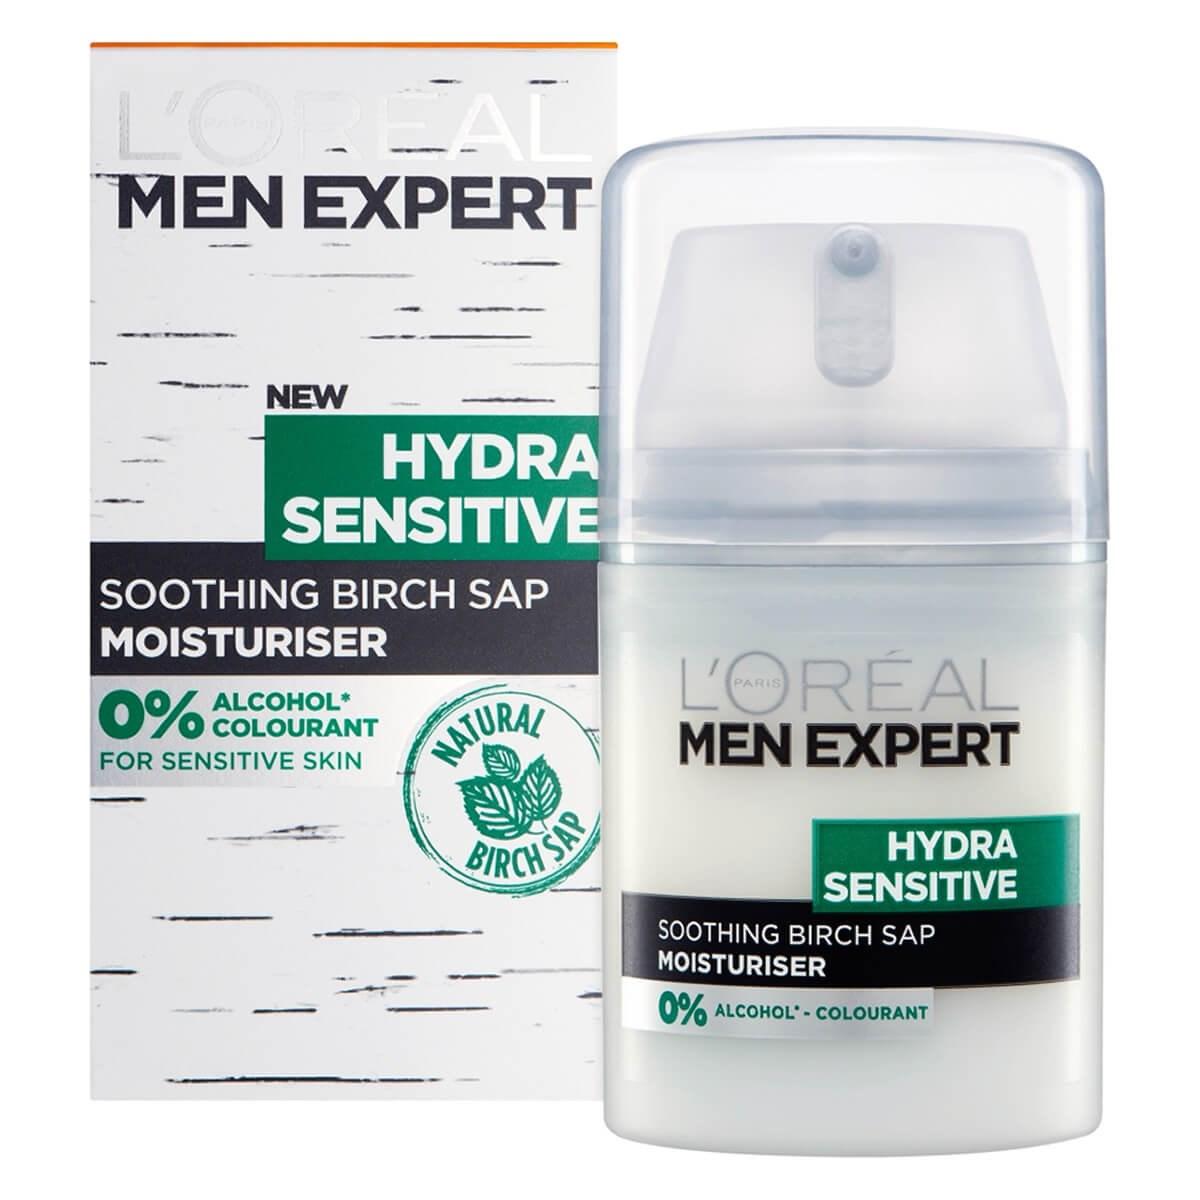 L'Oreal Paris Men Expert Hydra Sensitive Soothing Moisturiser